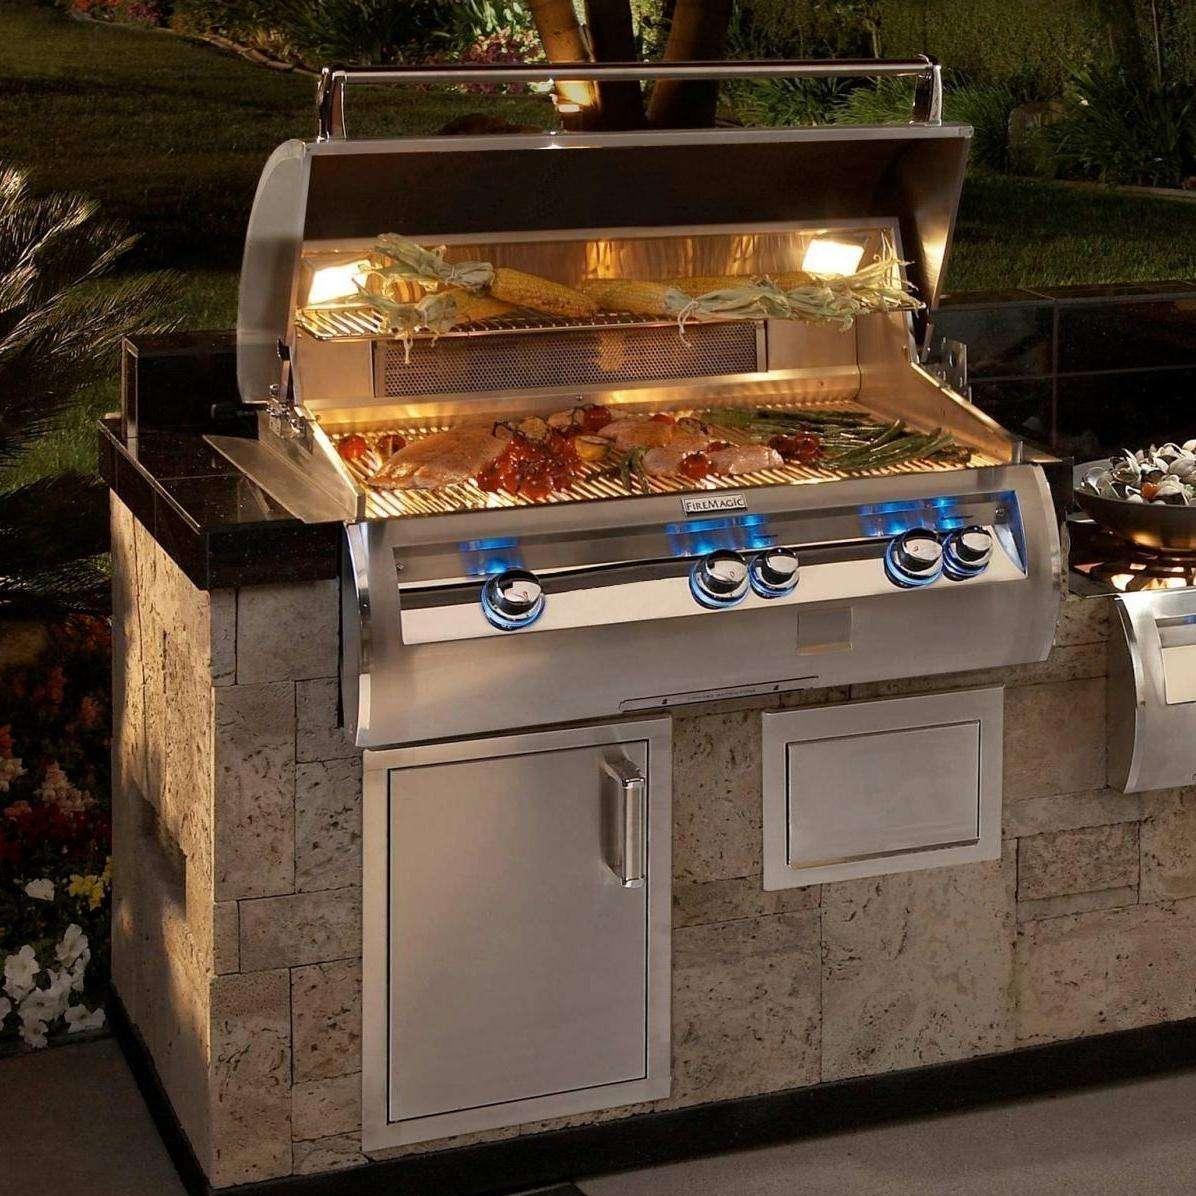 Fire Magic Echelon Diamond E790i 36-Inch Built-In NG Grill on Built In Grill Backyard id=11520